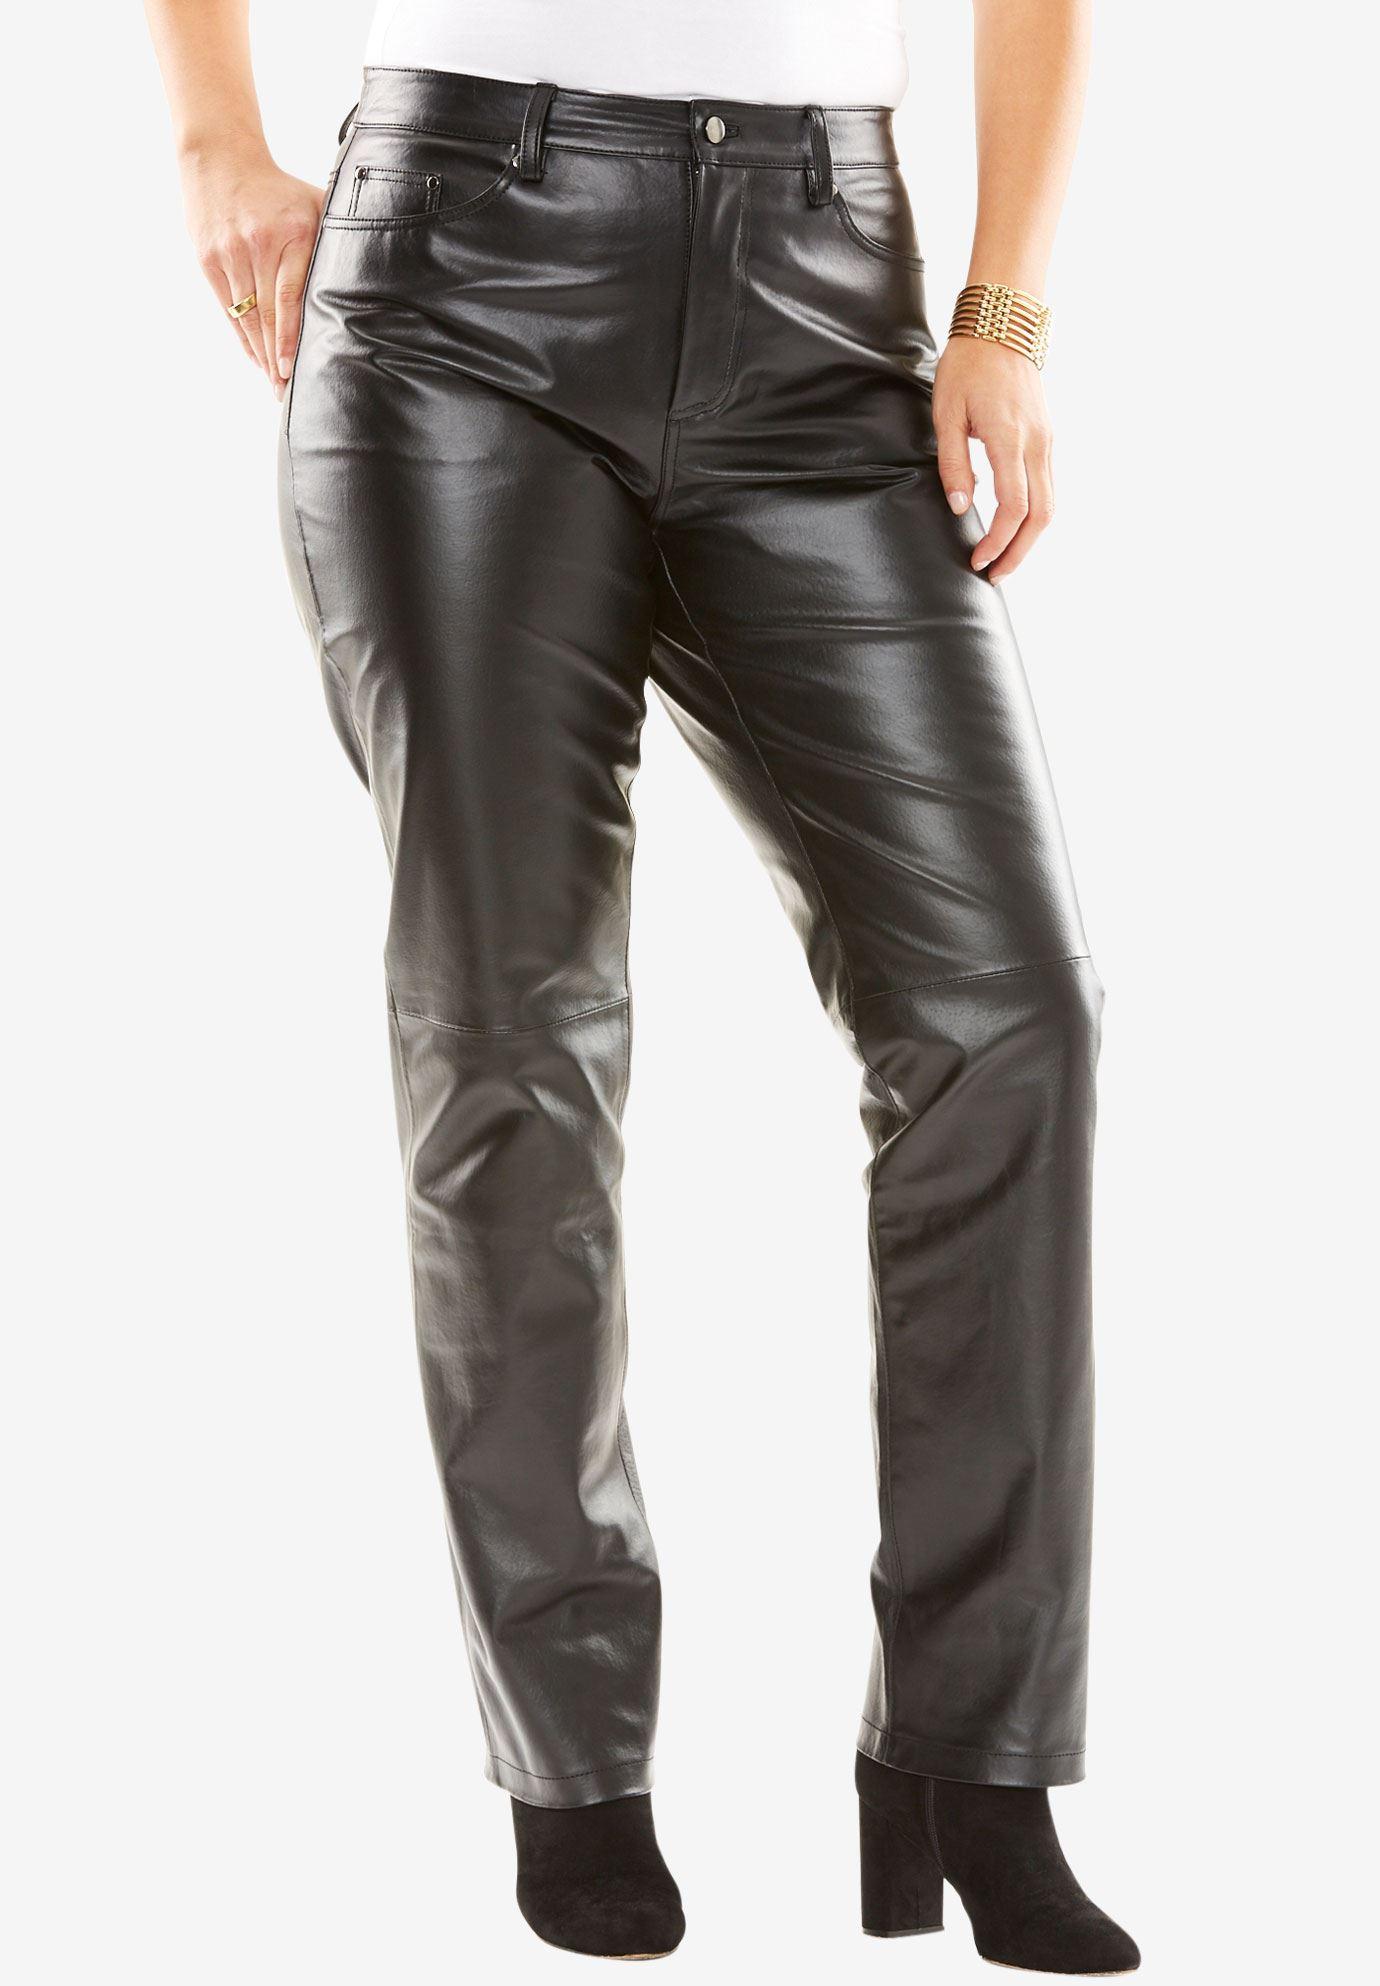 34e5a6ad875 Straight Leg Leather Pants